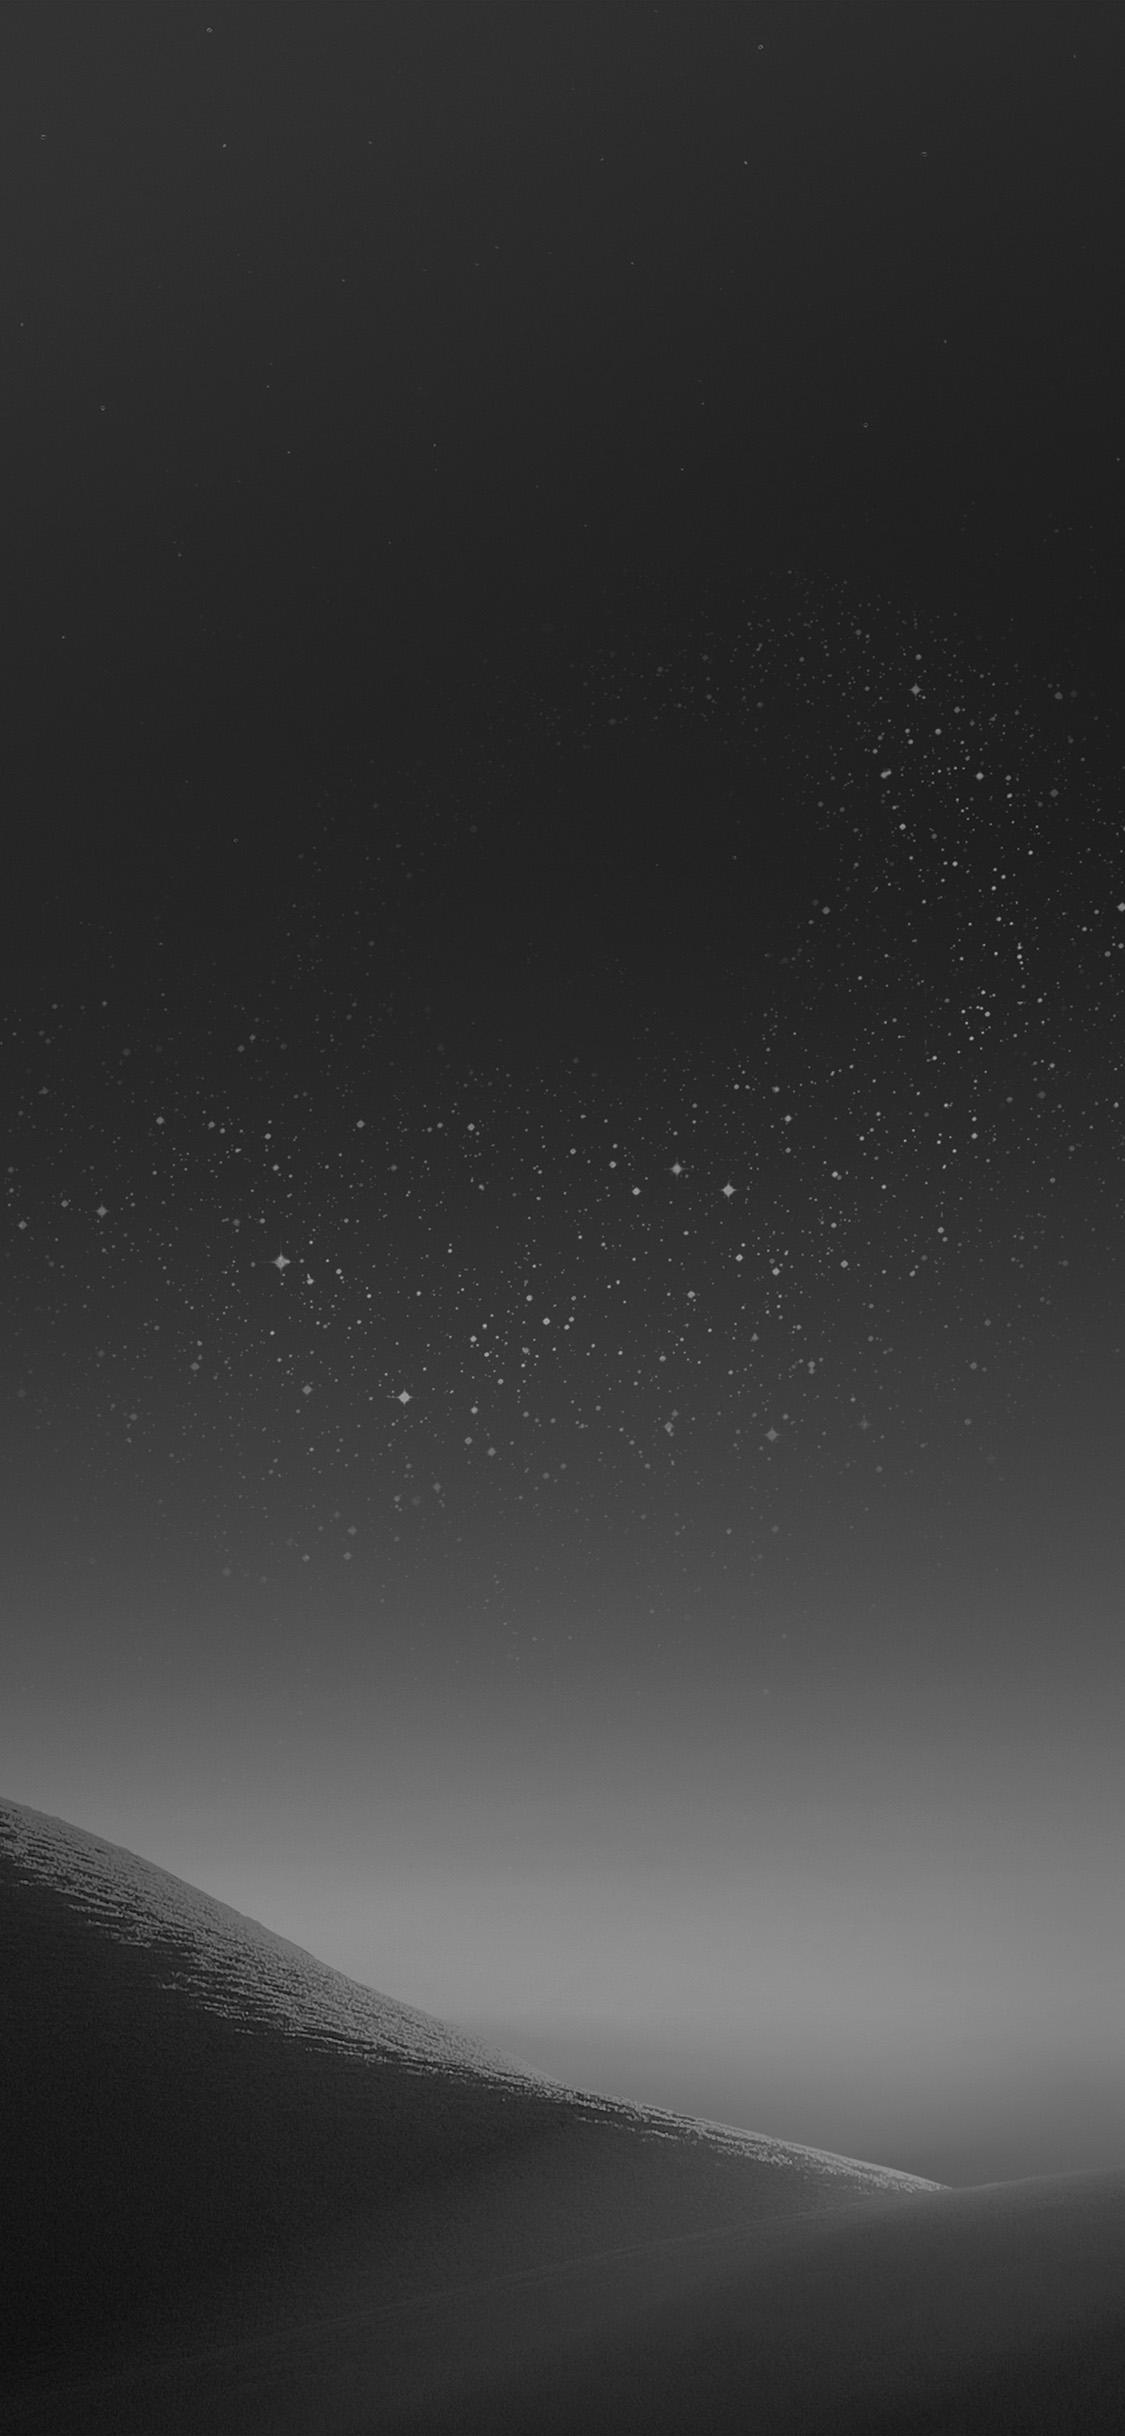 Iphonexpapers Com Iphone X Wallpaper Bc37 Galaxy Night Sky Star Art Illustration Samsung Dark Bw